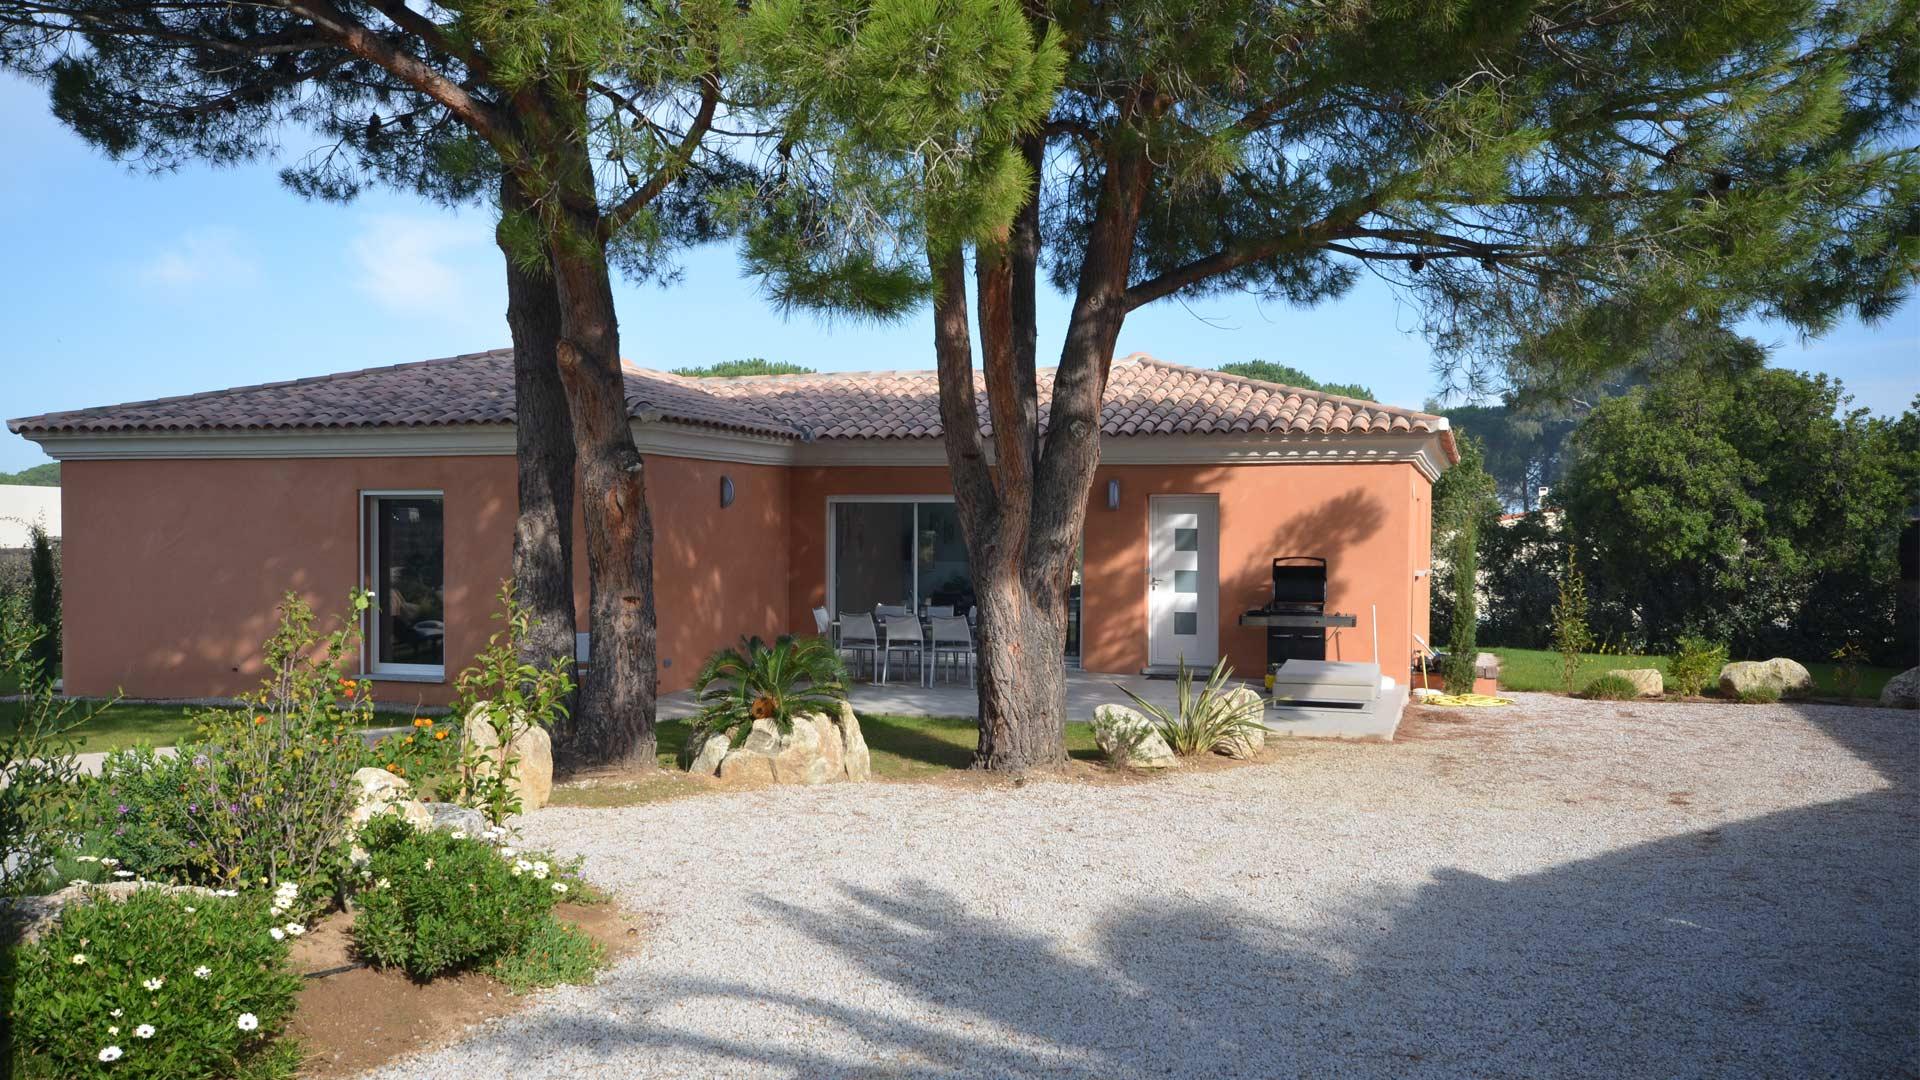 Villa Villa Tulia, Rental in Corsica